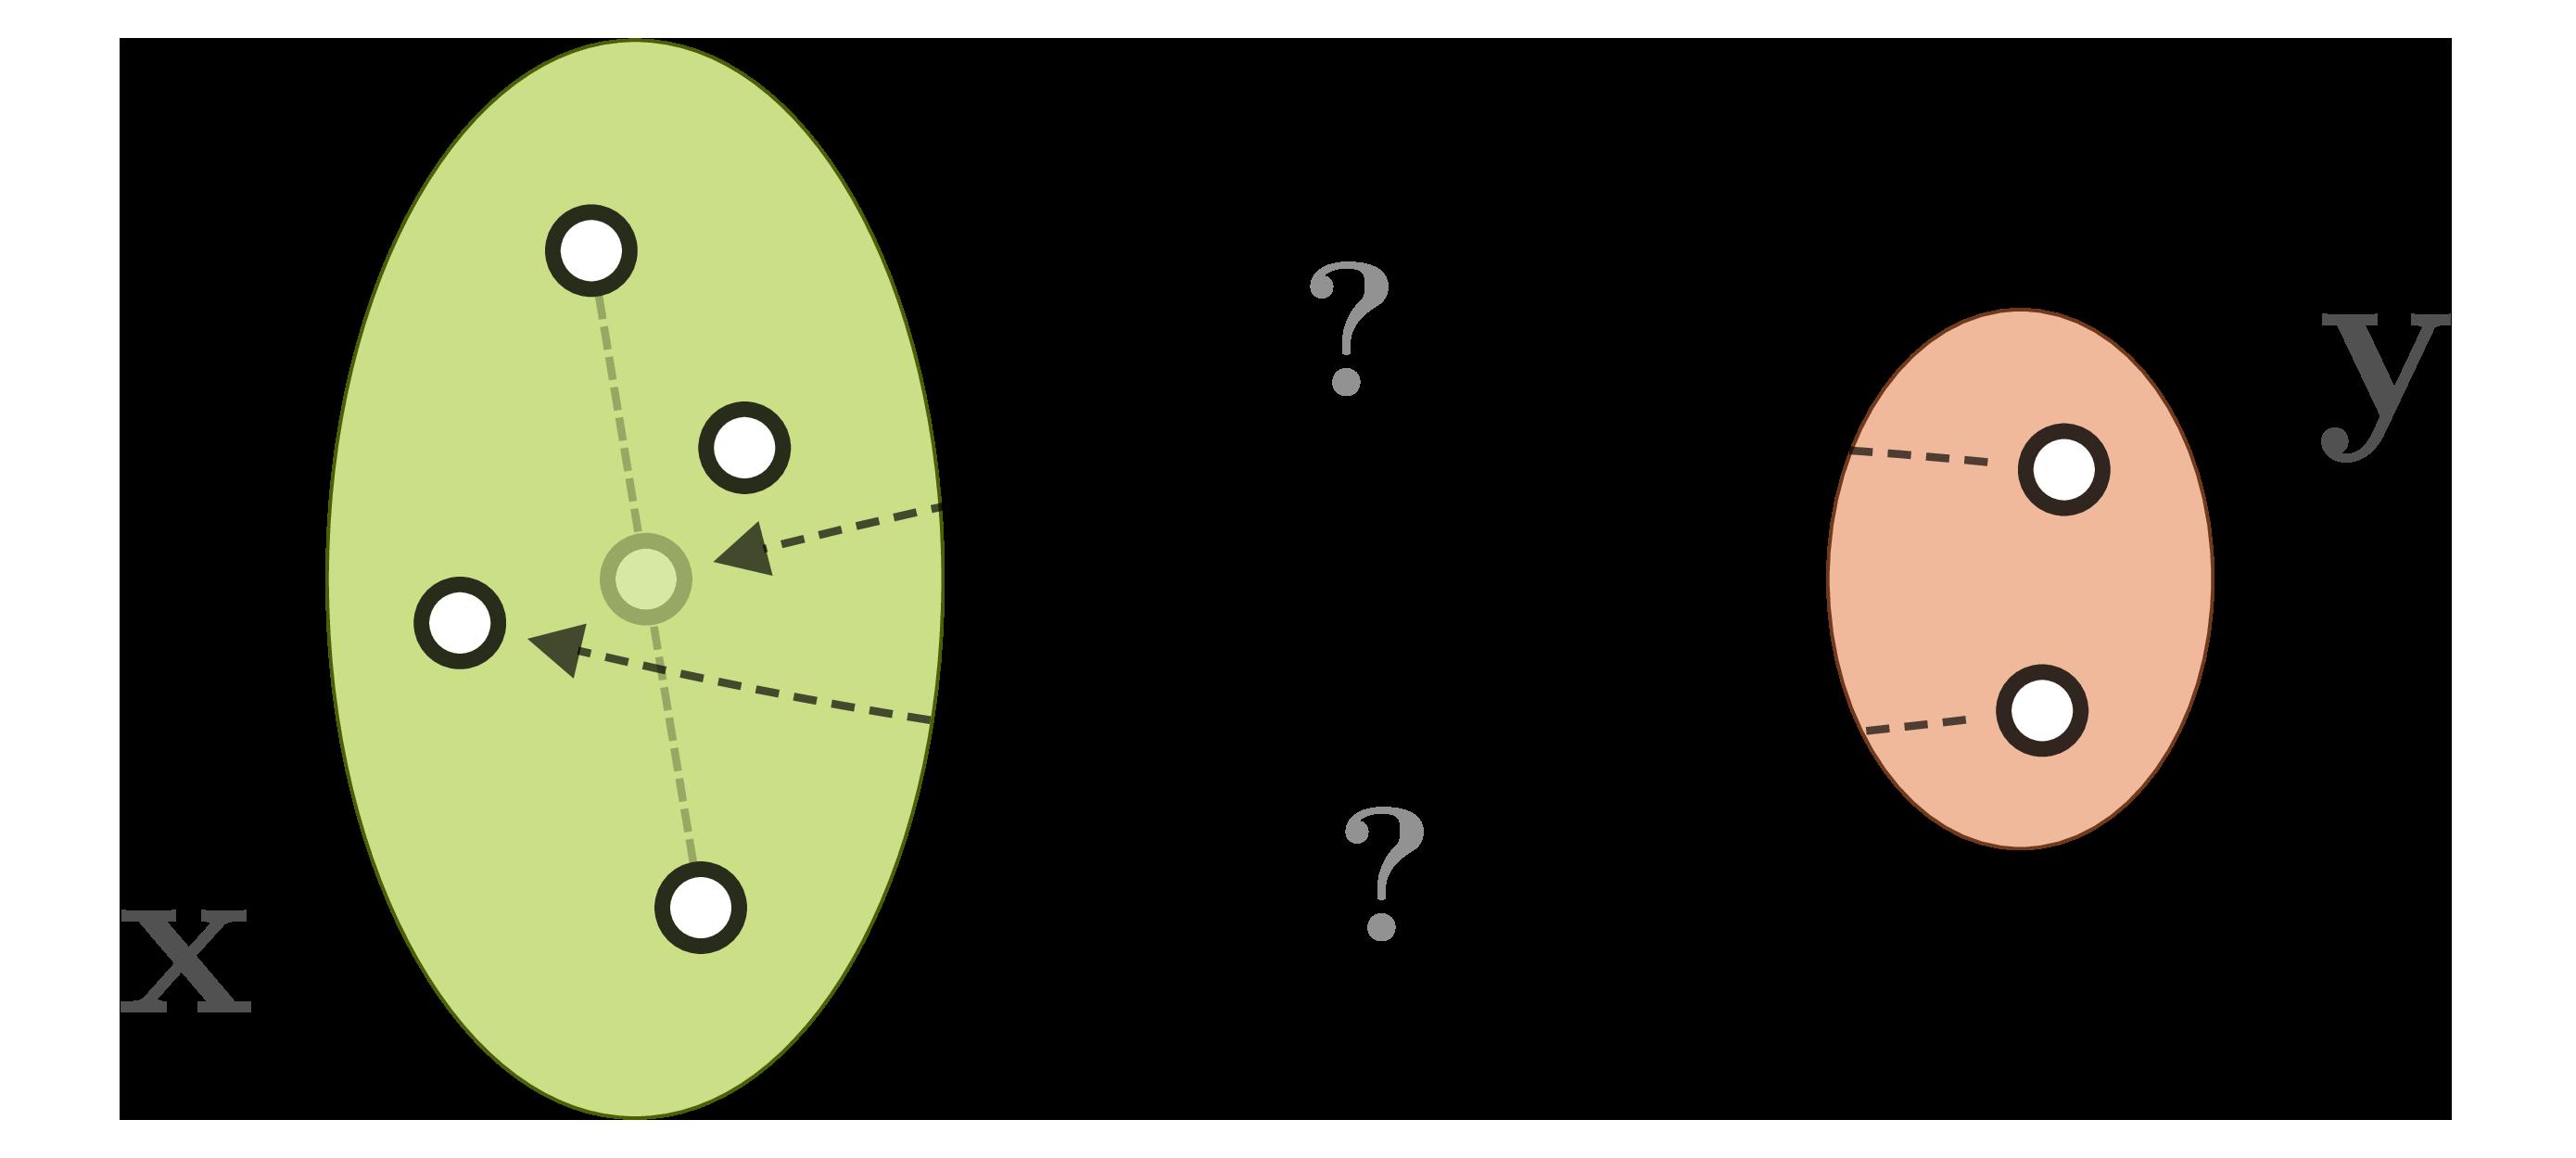 Ambiguous inverse process